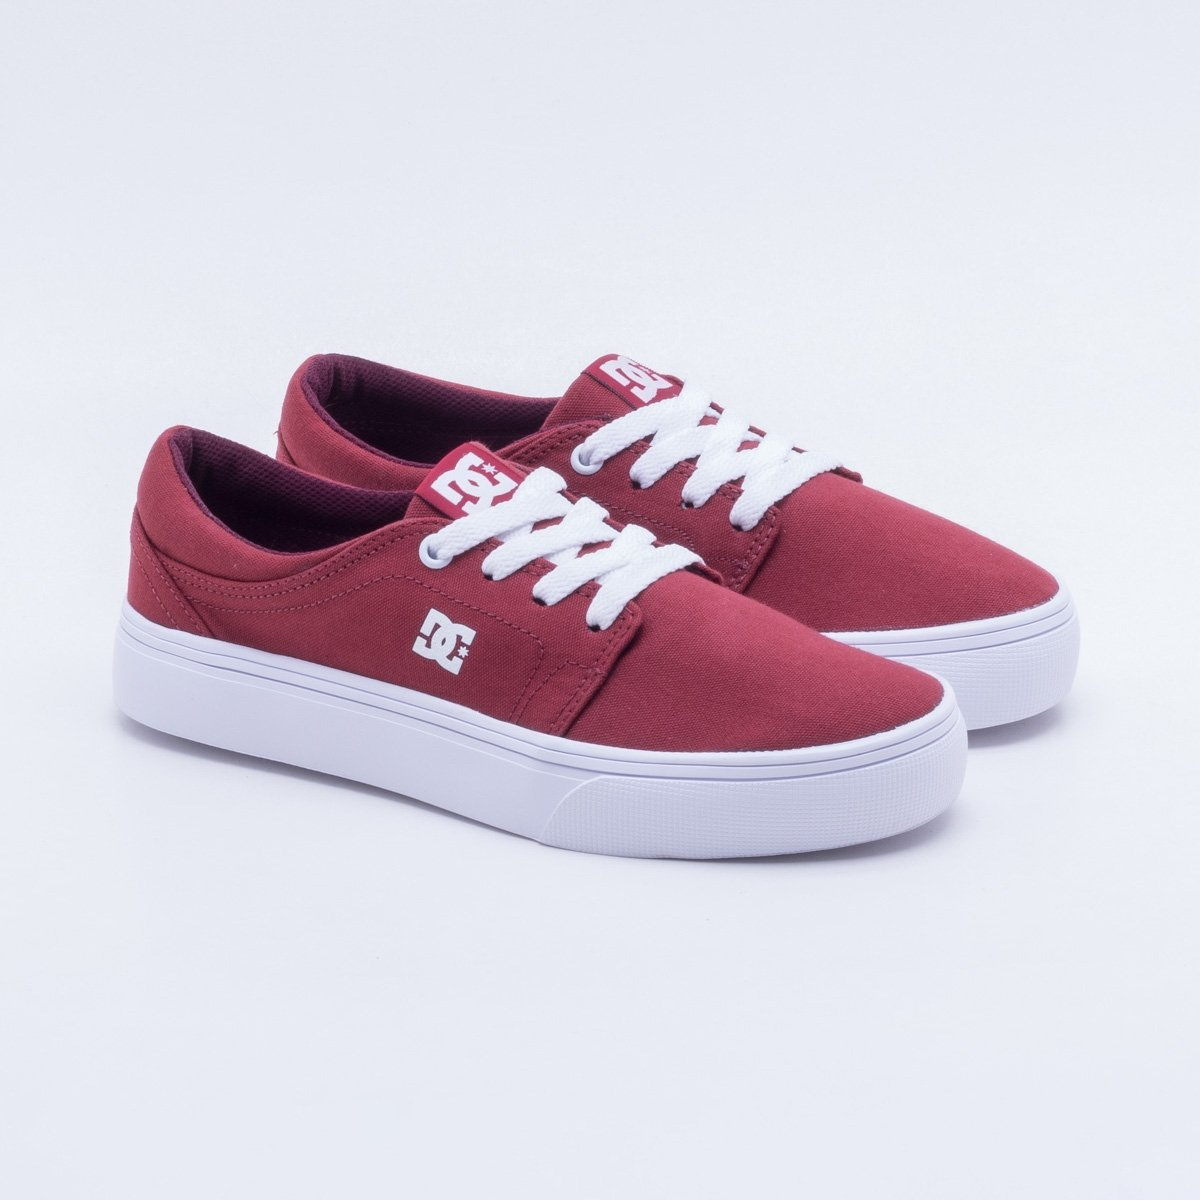 Shoes TX Trase Feminino Tênis DC Tênis W Vermelho DC Oqp1Z